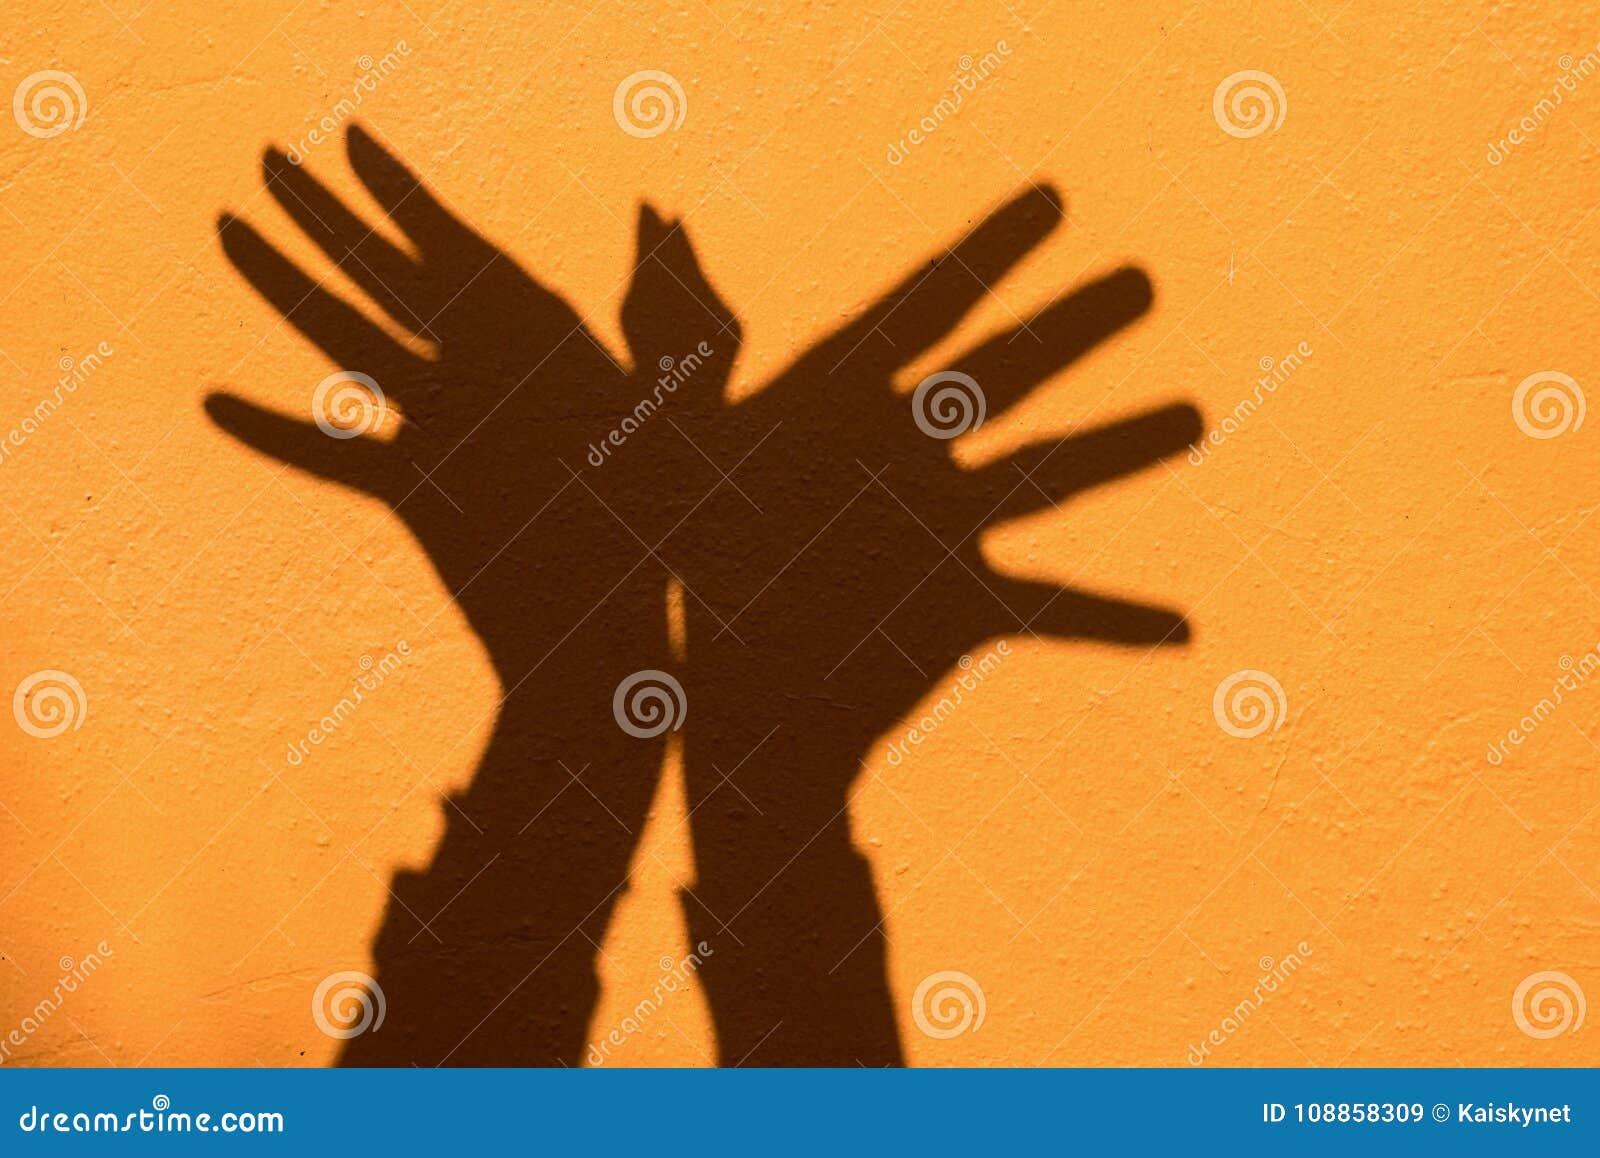 Shadow of hand symbol mean animal like a Bird on Orange wall background